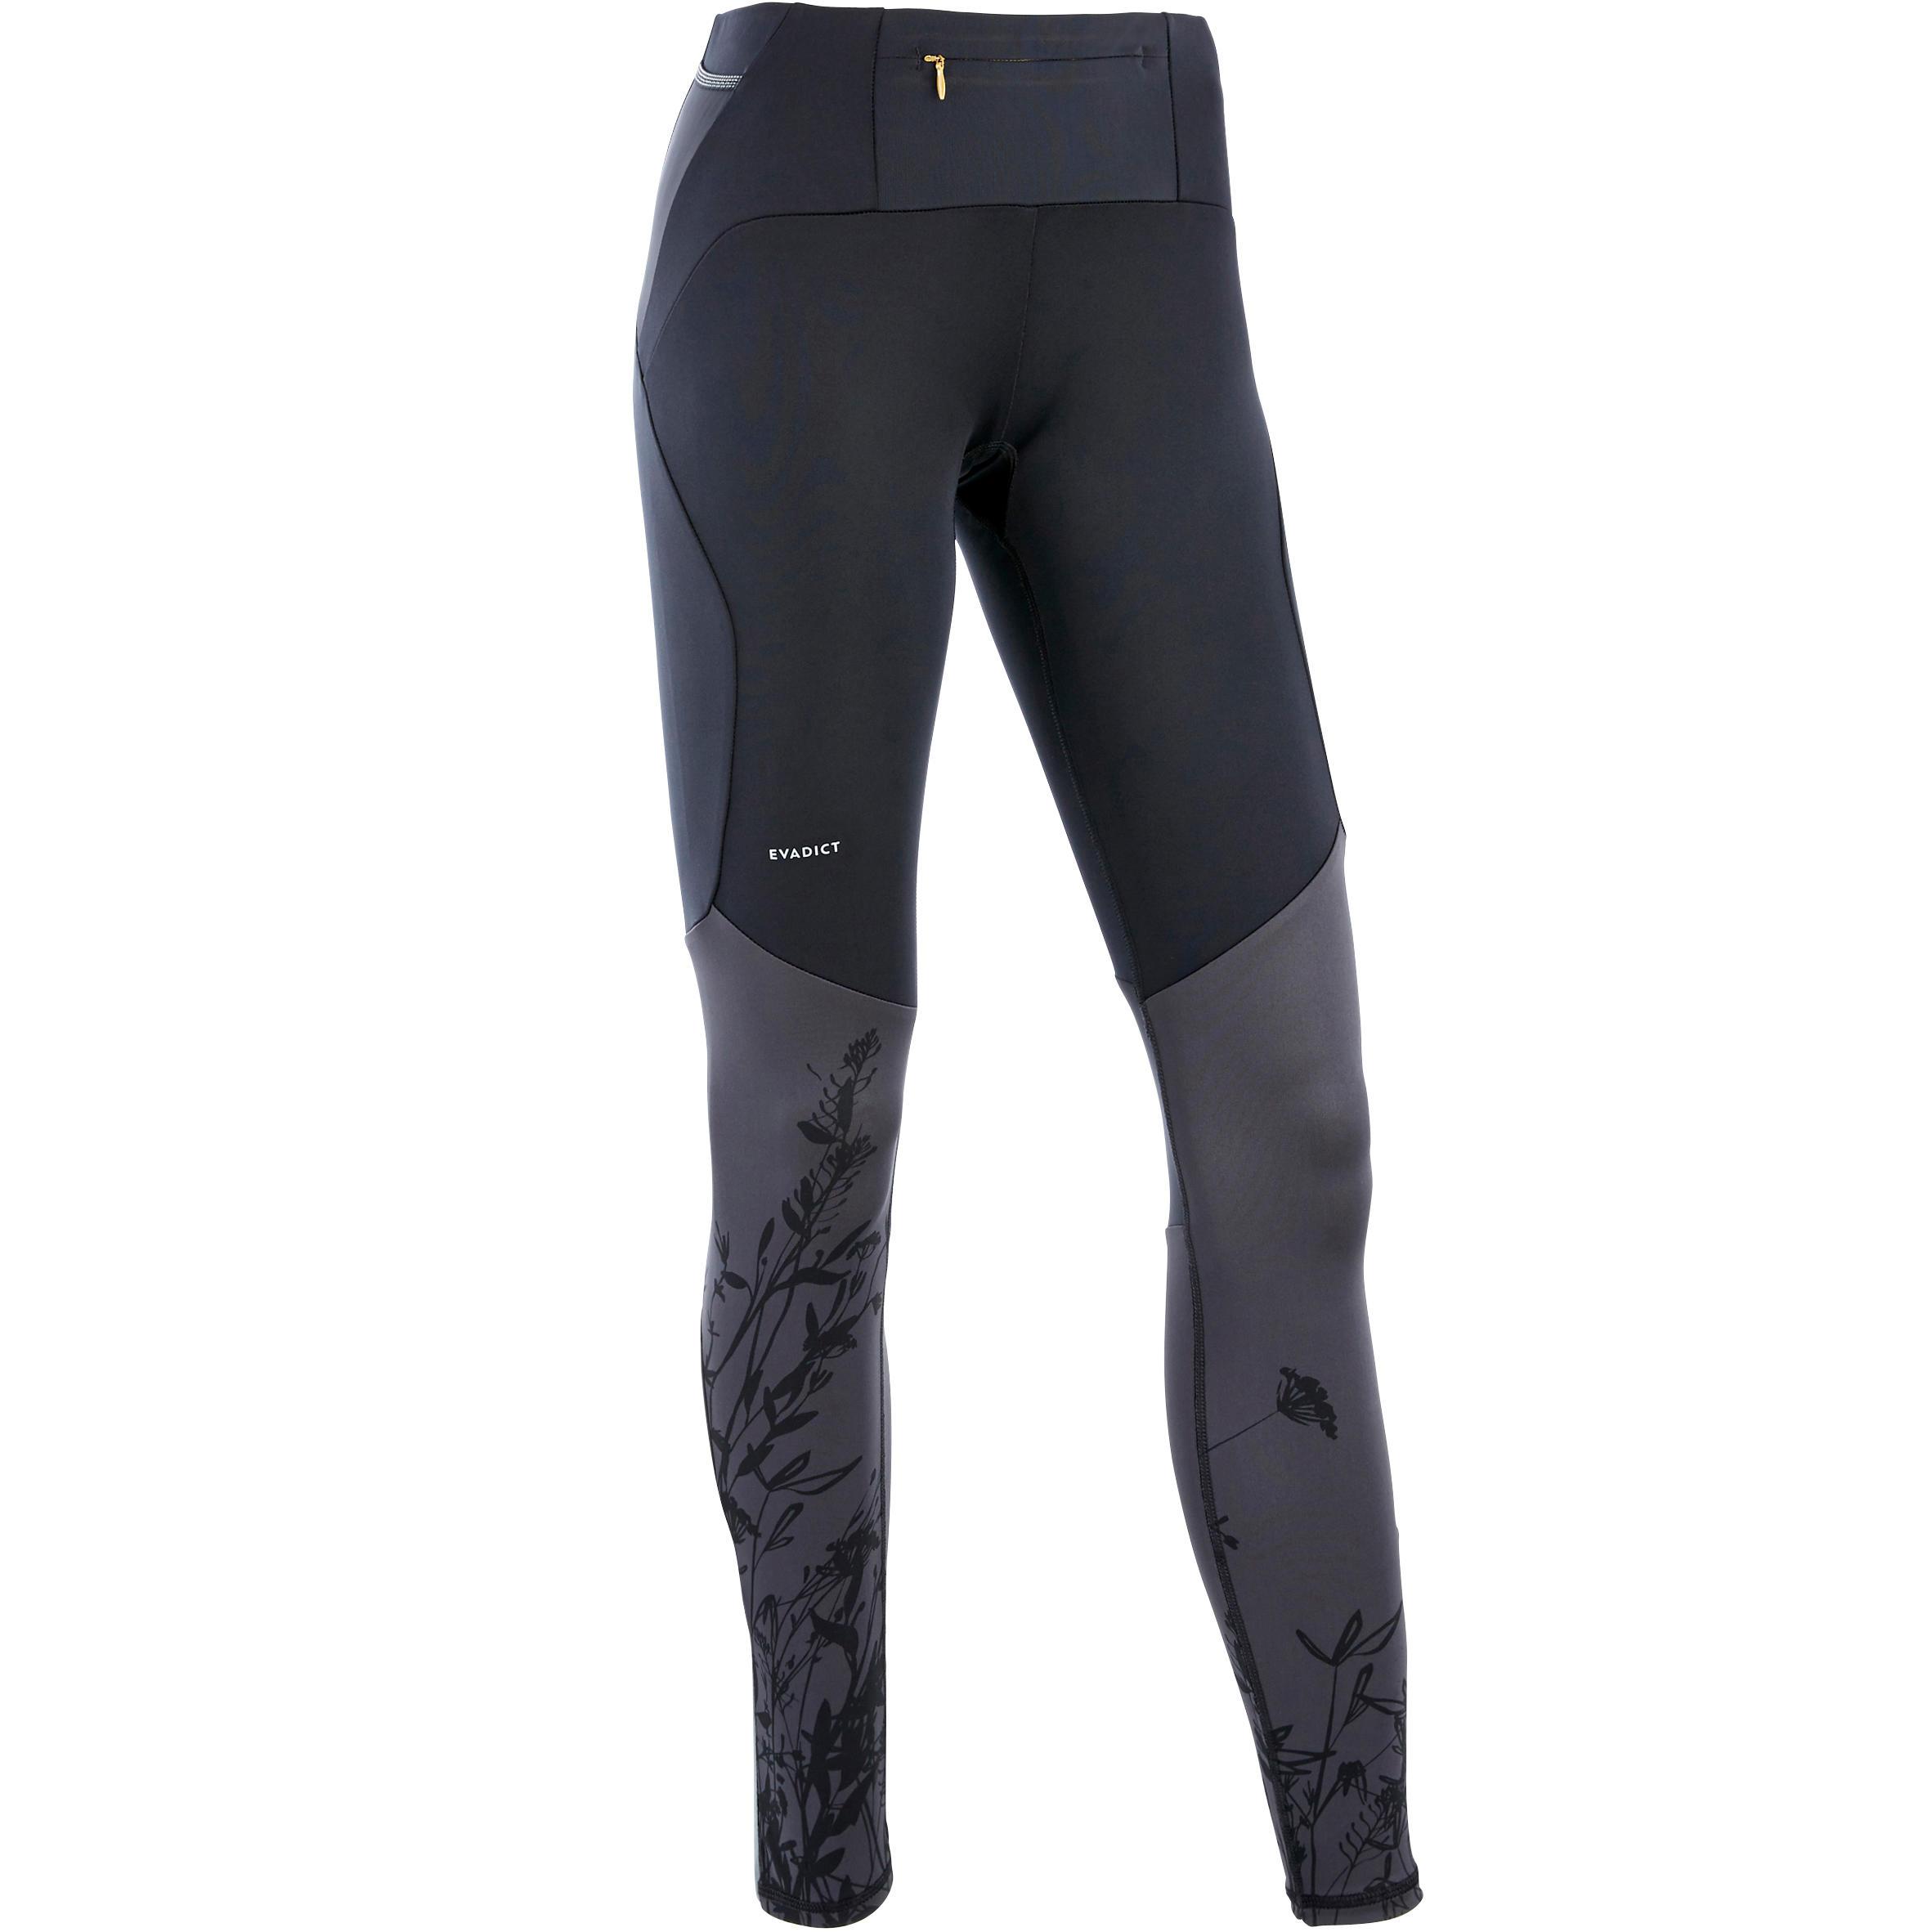 Laufhose lang Tights Trail Damen schwarz/grau Blumenmuster   Sportbekleidung > Sporthosen > Laufhosen   Evadict